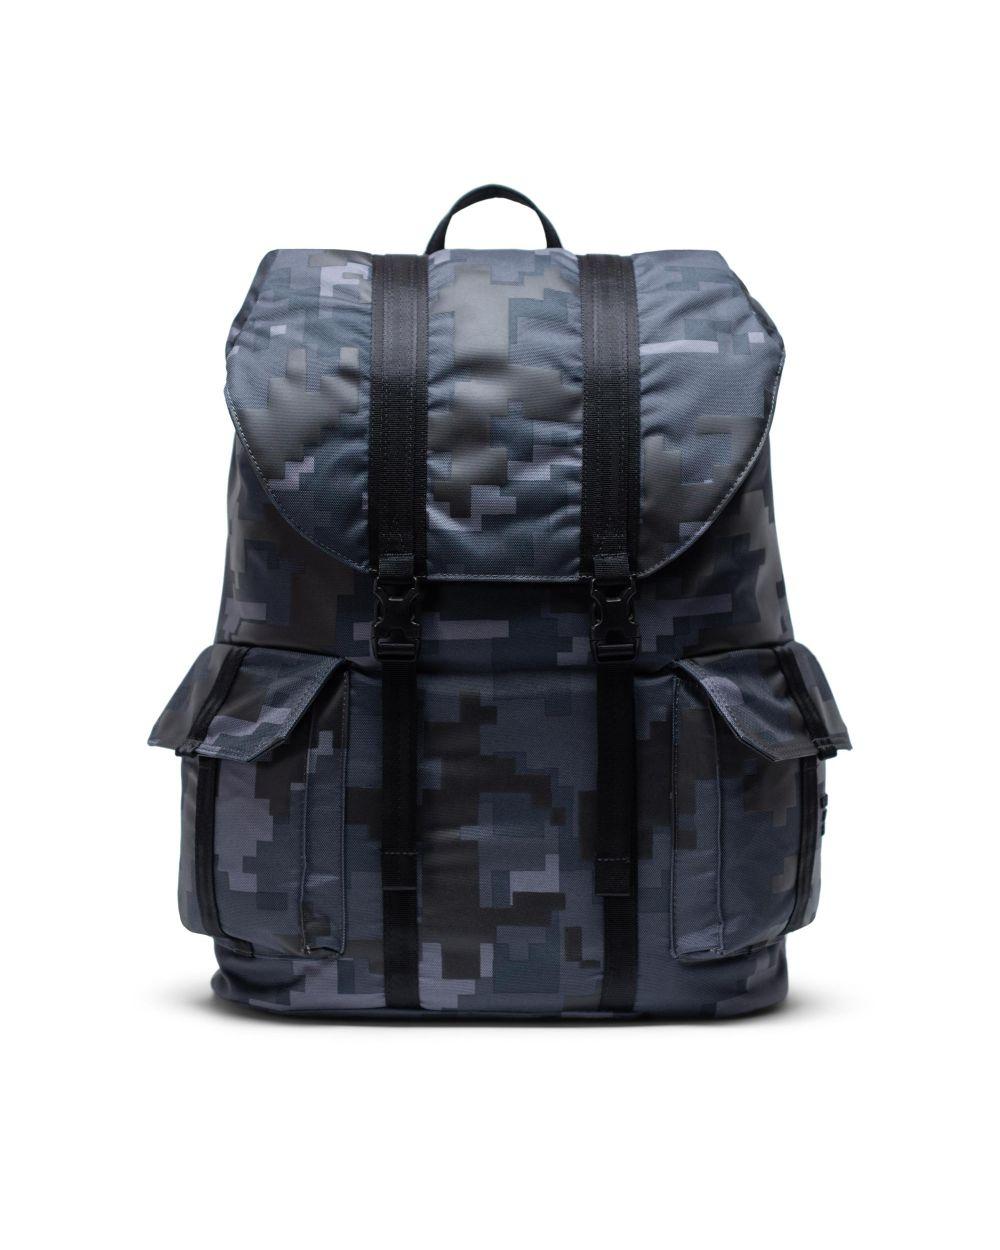 Herschel dawson backpack XL in blue army print